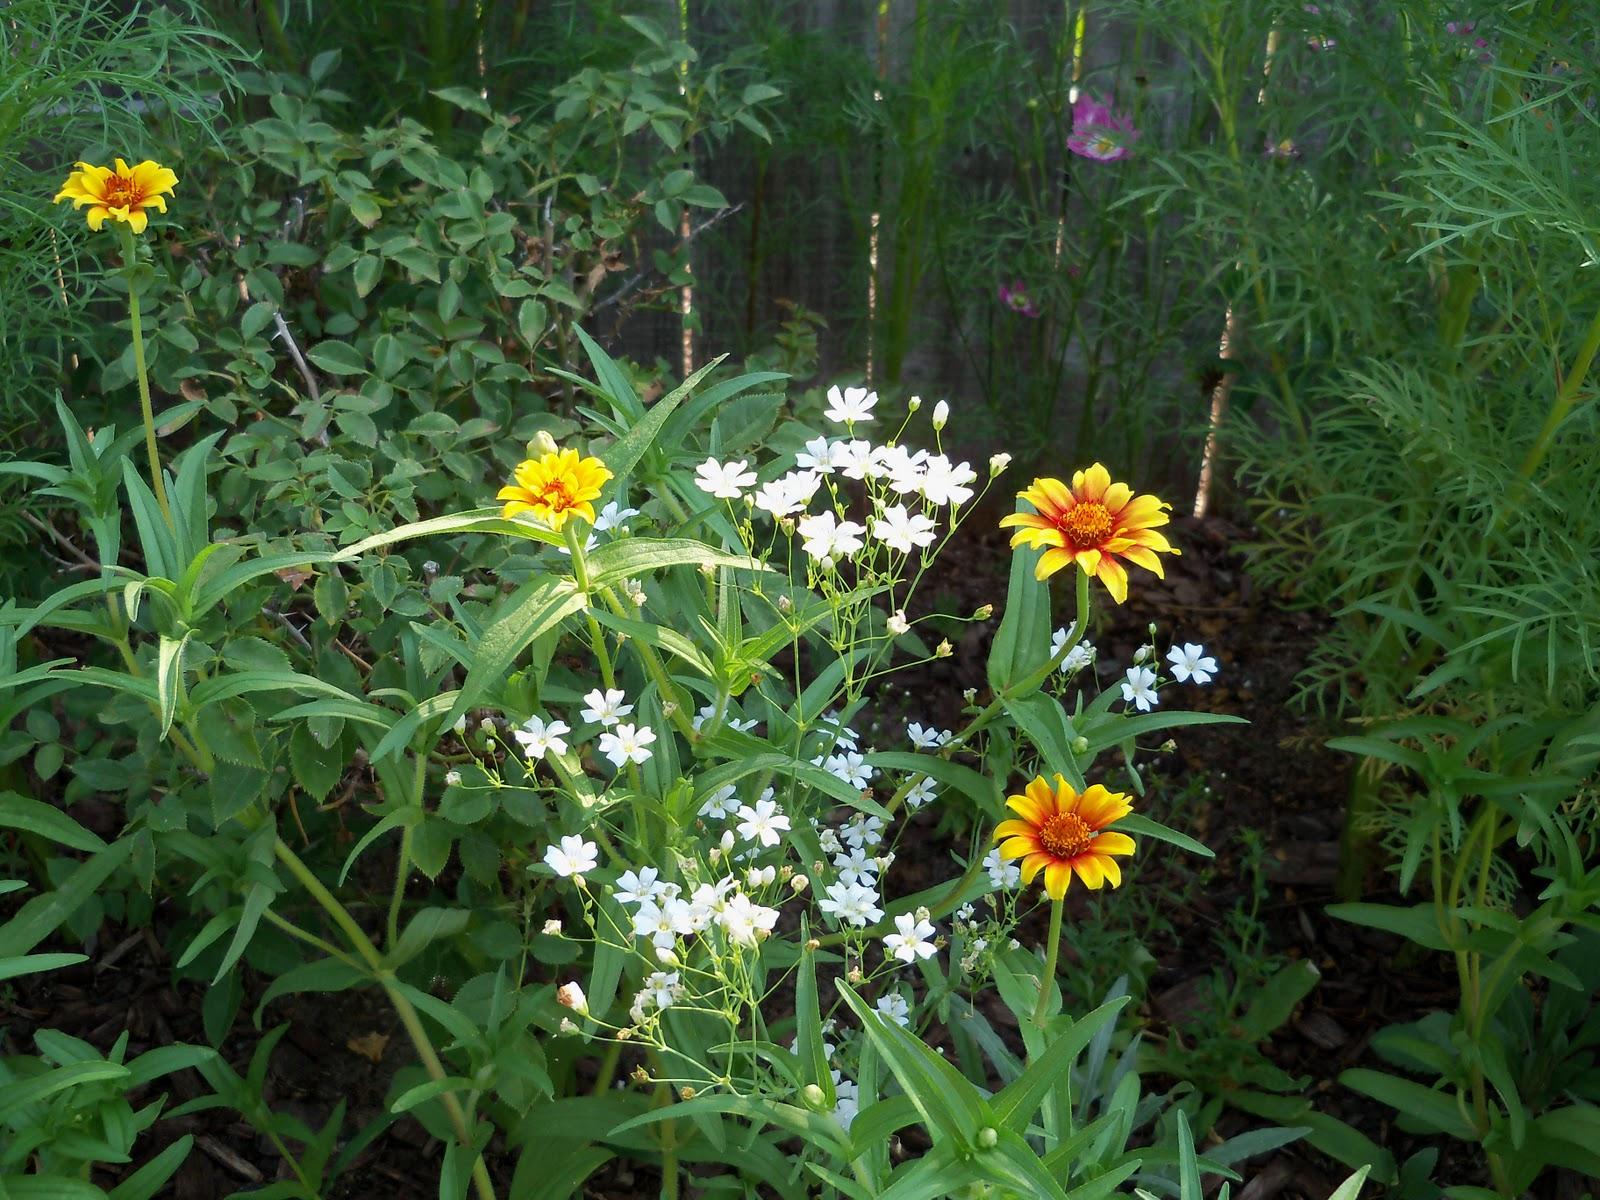 Gardening 2010, Part Two - 101_3025.JPG